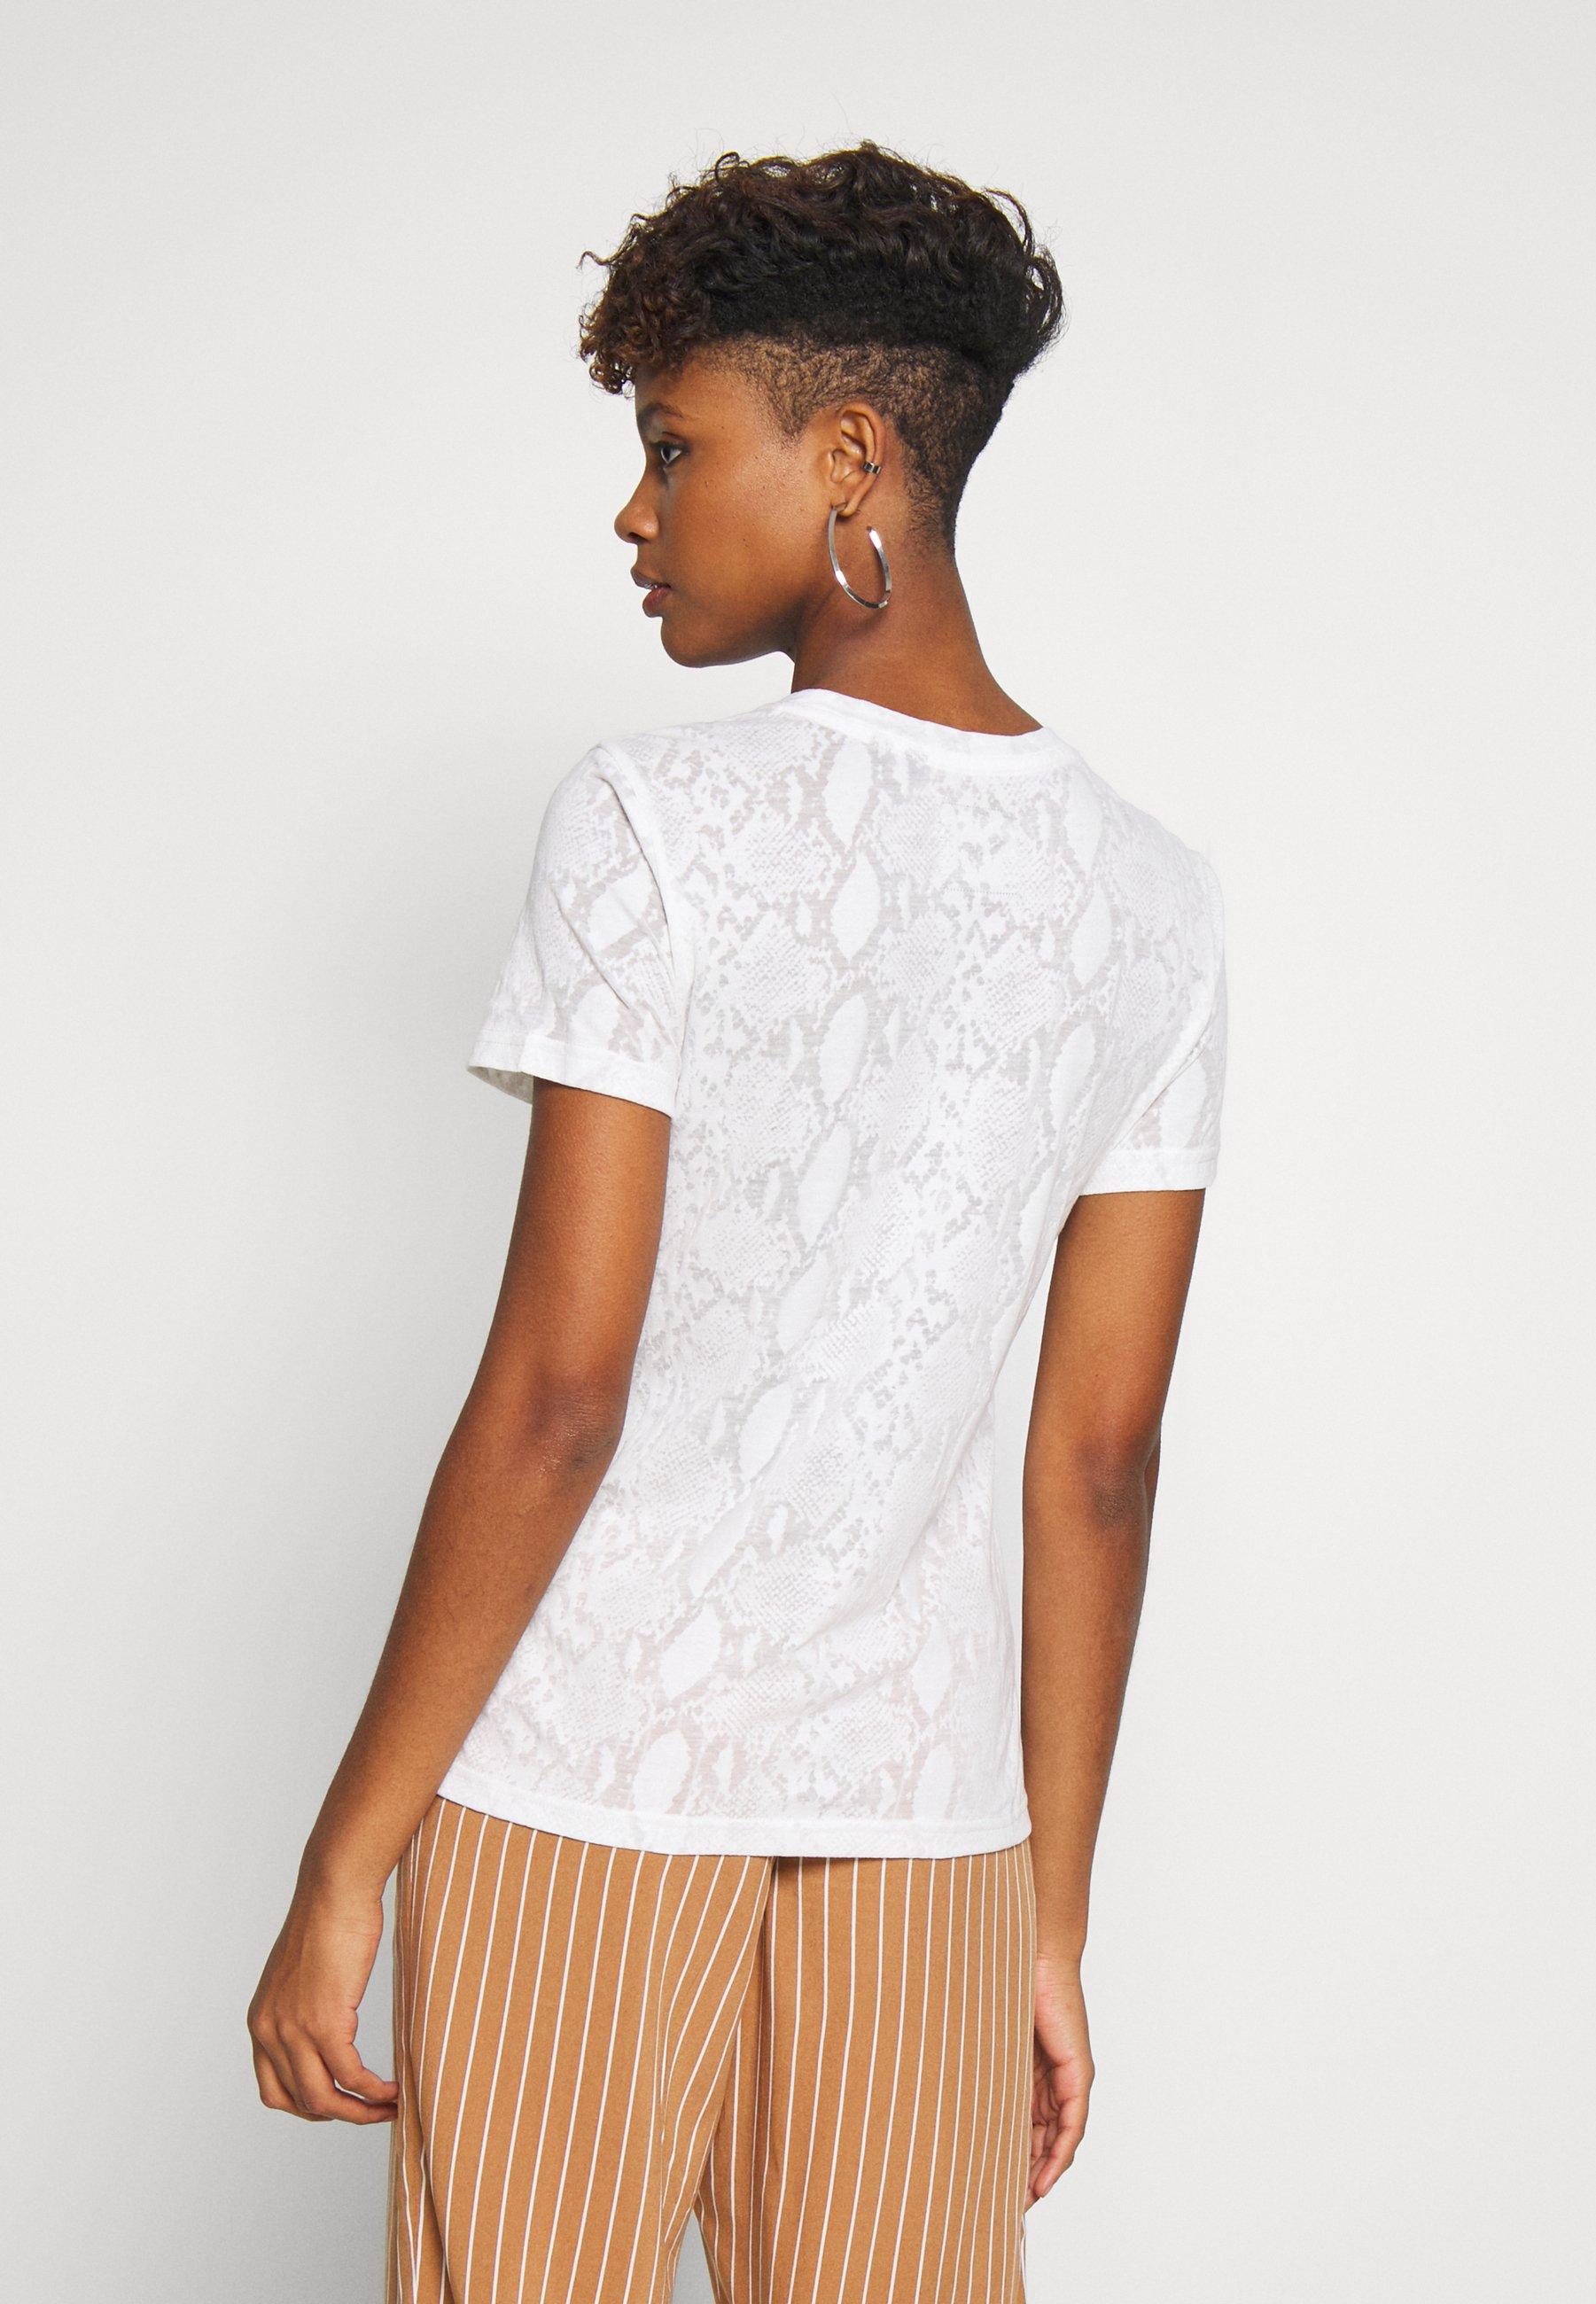 Superdry SNAKE BURNOUT ENTRY TEE - T-shirt imprimé - ecru - Tops & T-shirts Femme LSj58